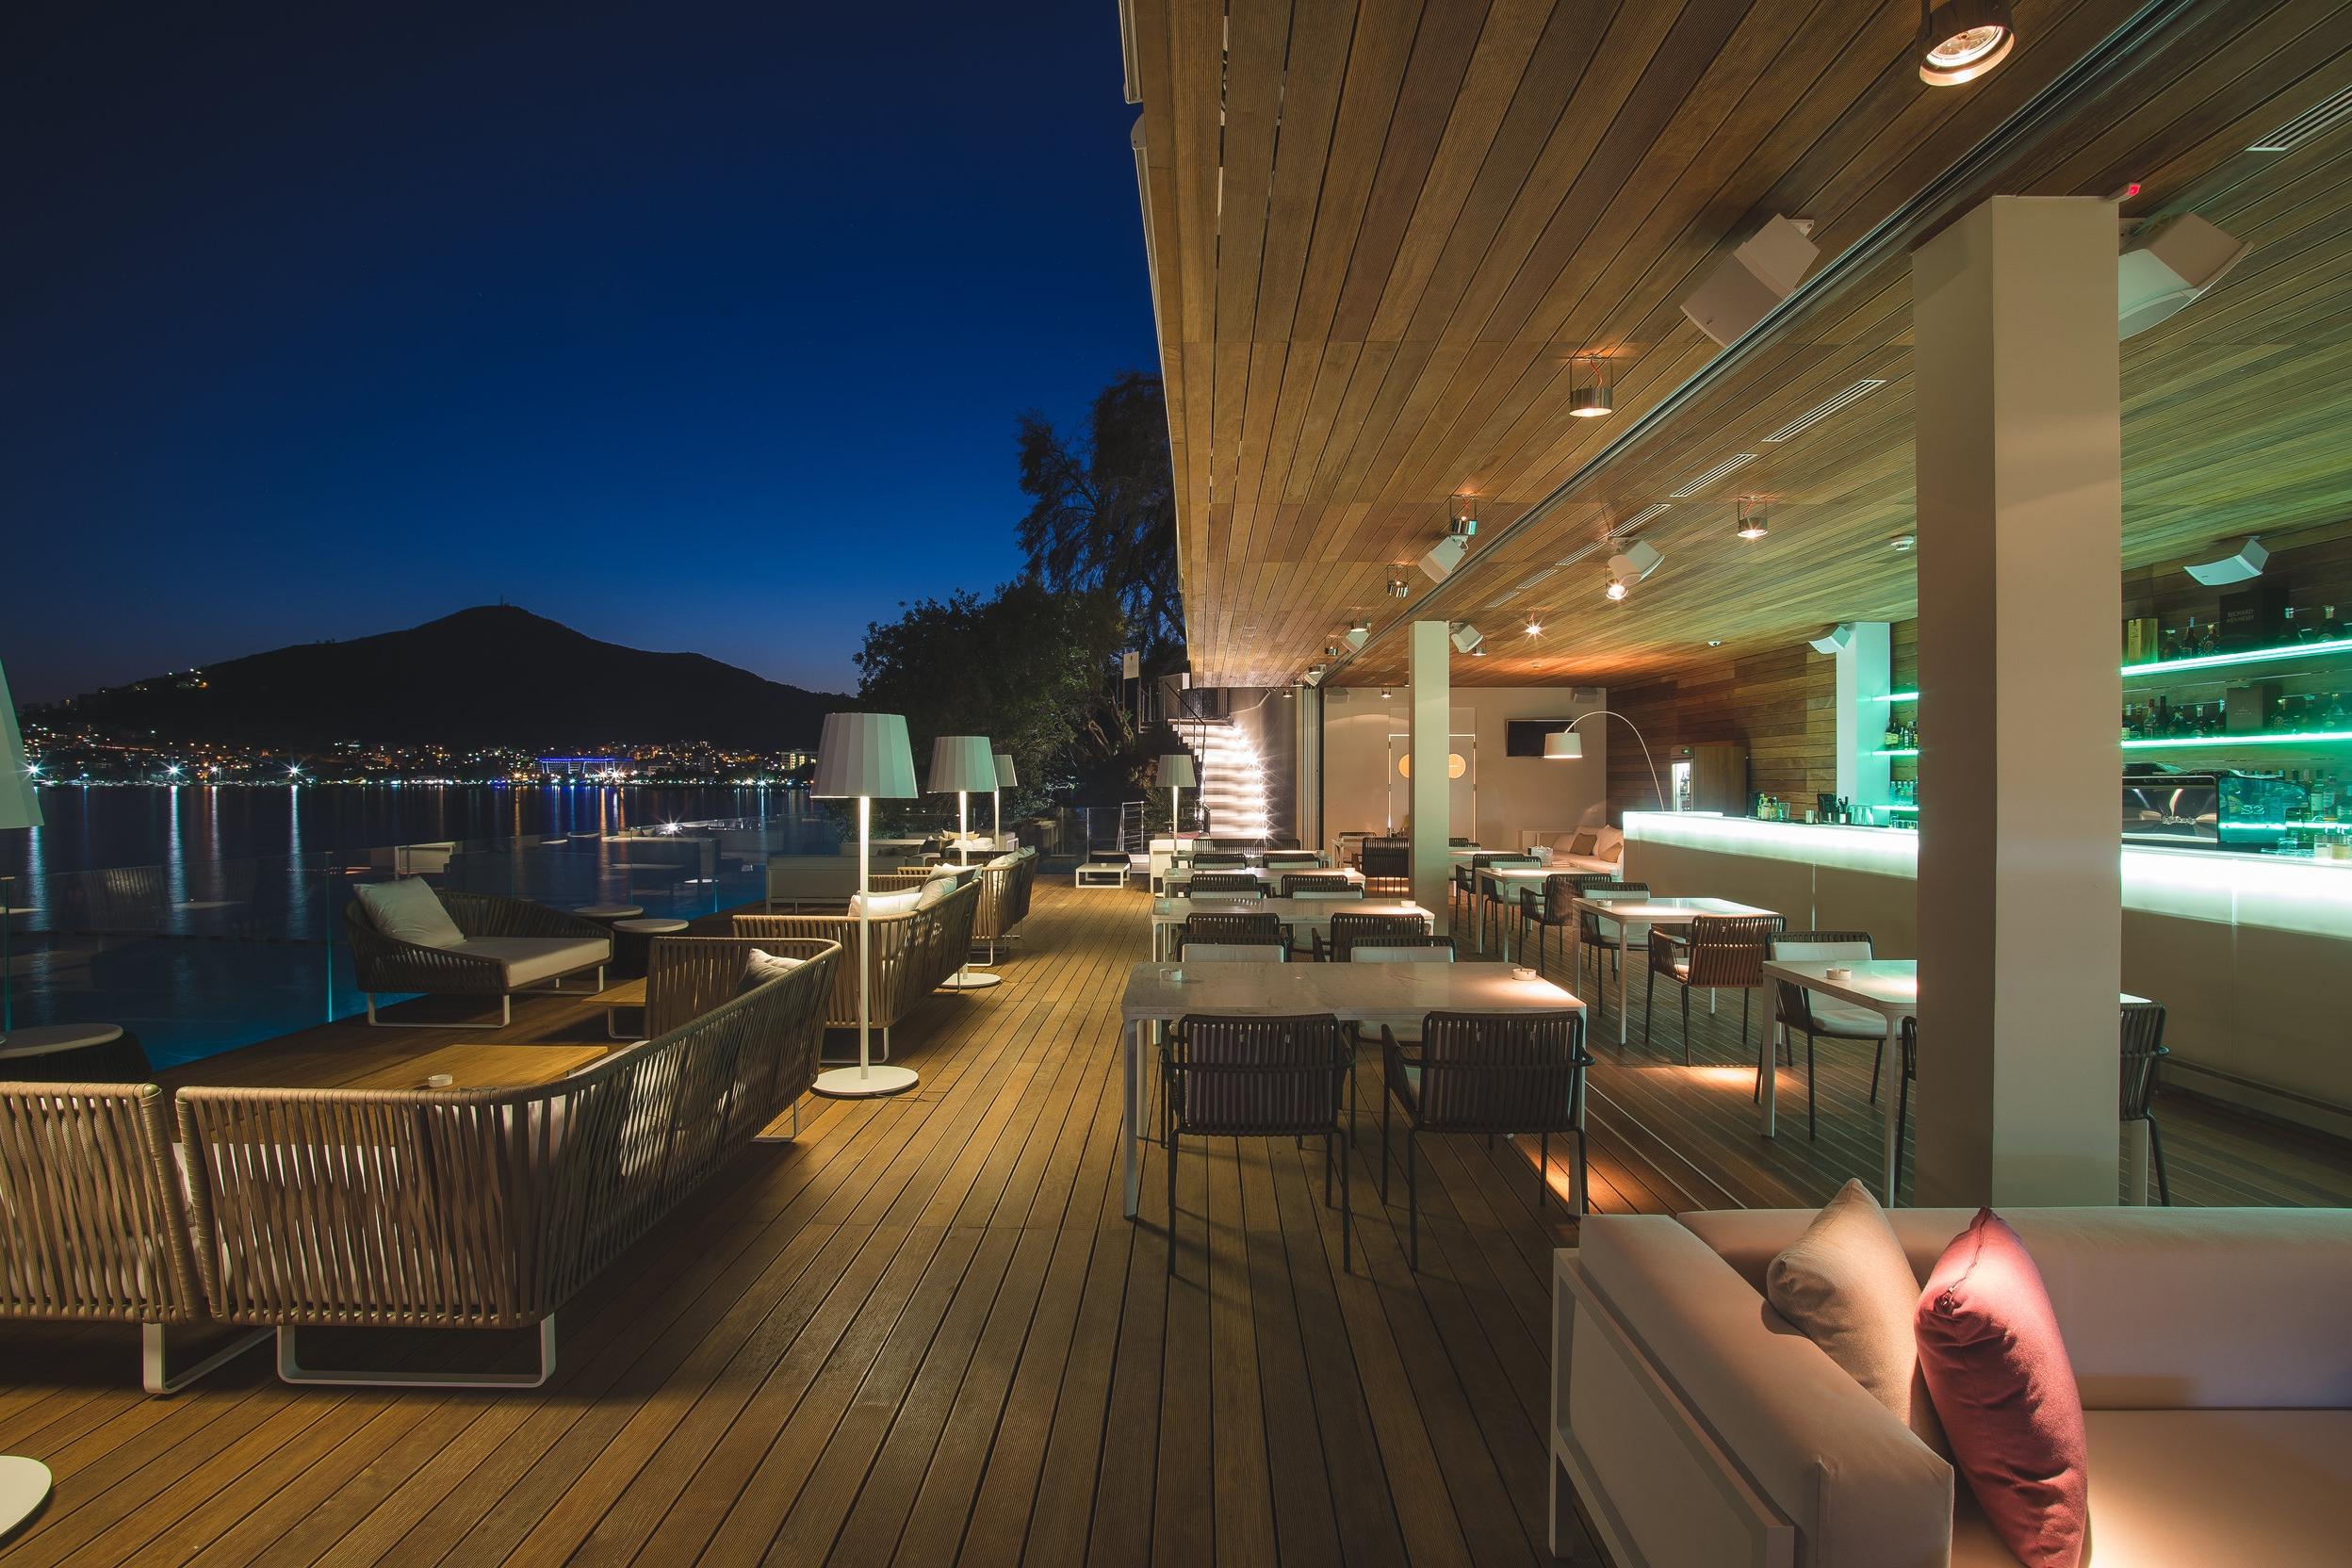 Fine dining restaurant Dukley Beach Lounge